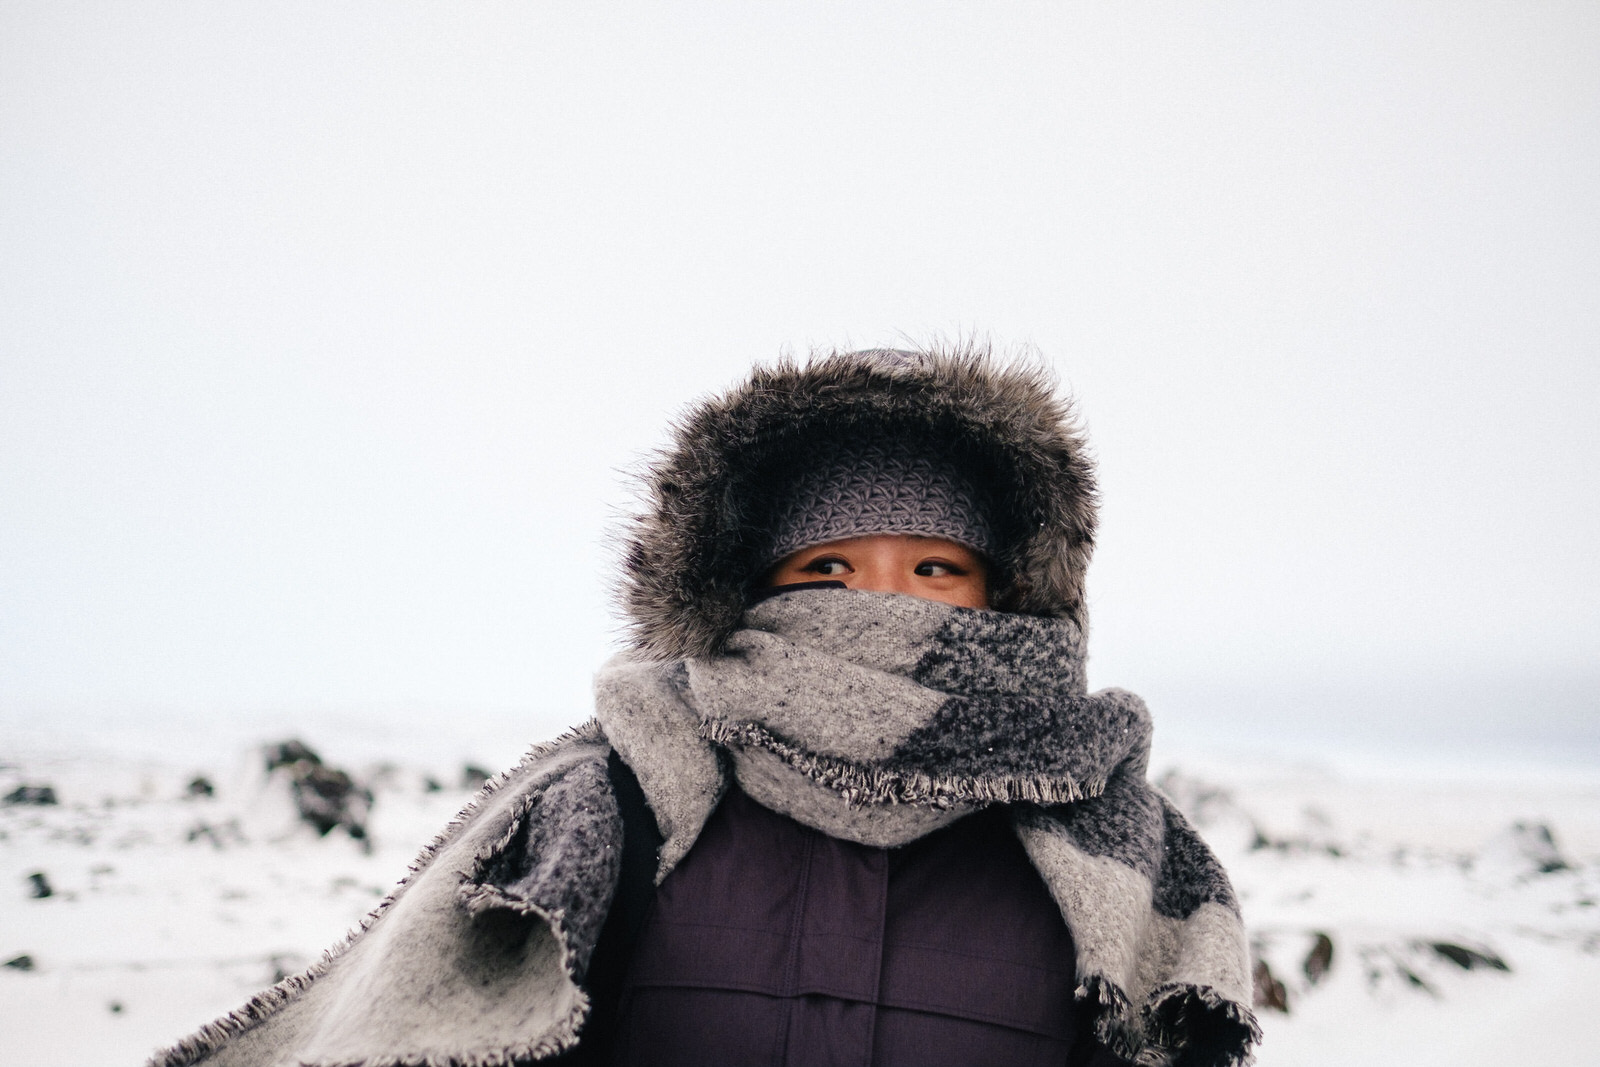 Collective_Wander_Iceland_Photographers_Trip_026.jpg